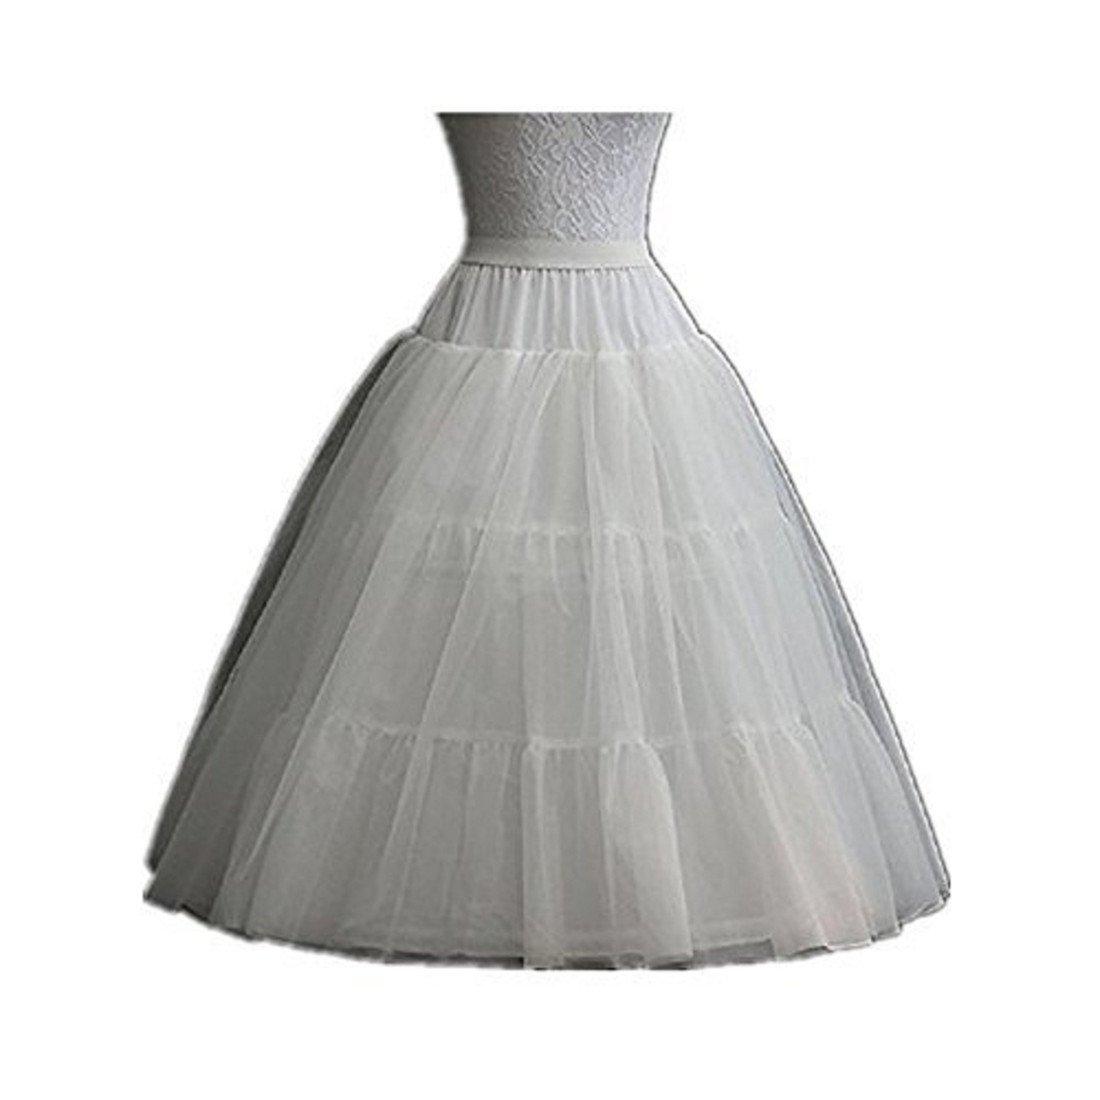 Noriviiq Kids Hoop/Hoopless Petticoat Underskirt Crinoline for Girls Princess Dress S9991350173-noca